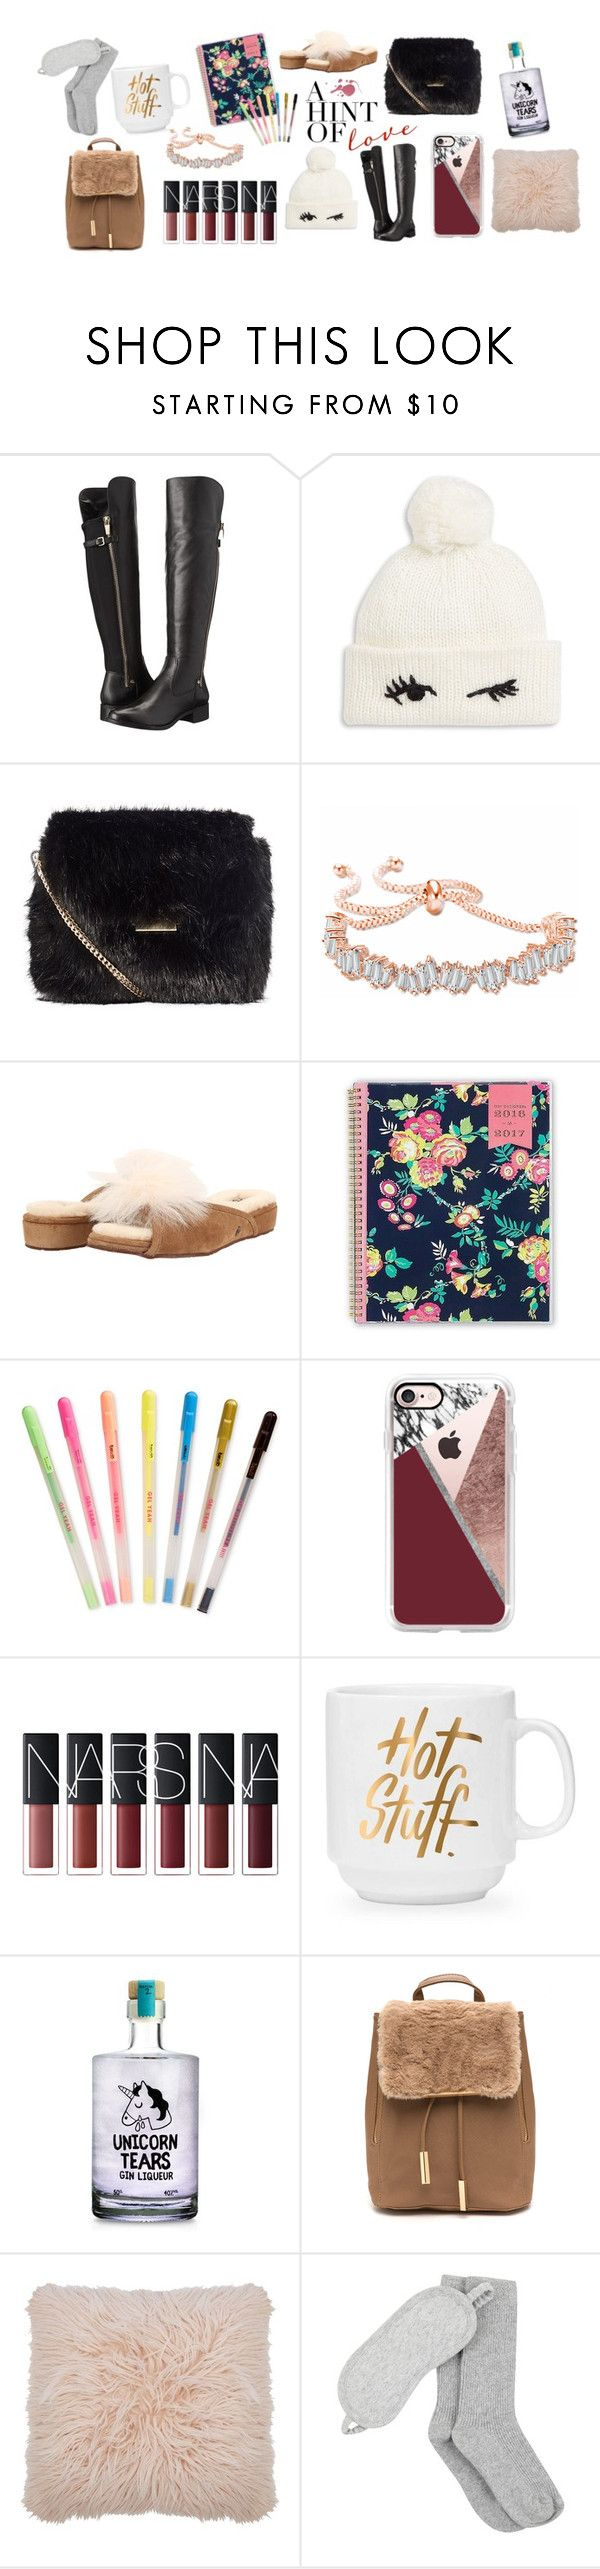 """BFF Gifts"" by wvazquez on Polyvore featuring Calvin Klein, Kate Spade, Karen Millen, UGG, Day Designer, ban.do, Casetify, M&Co and Mint Velvet"